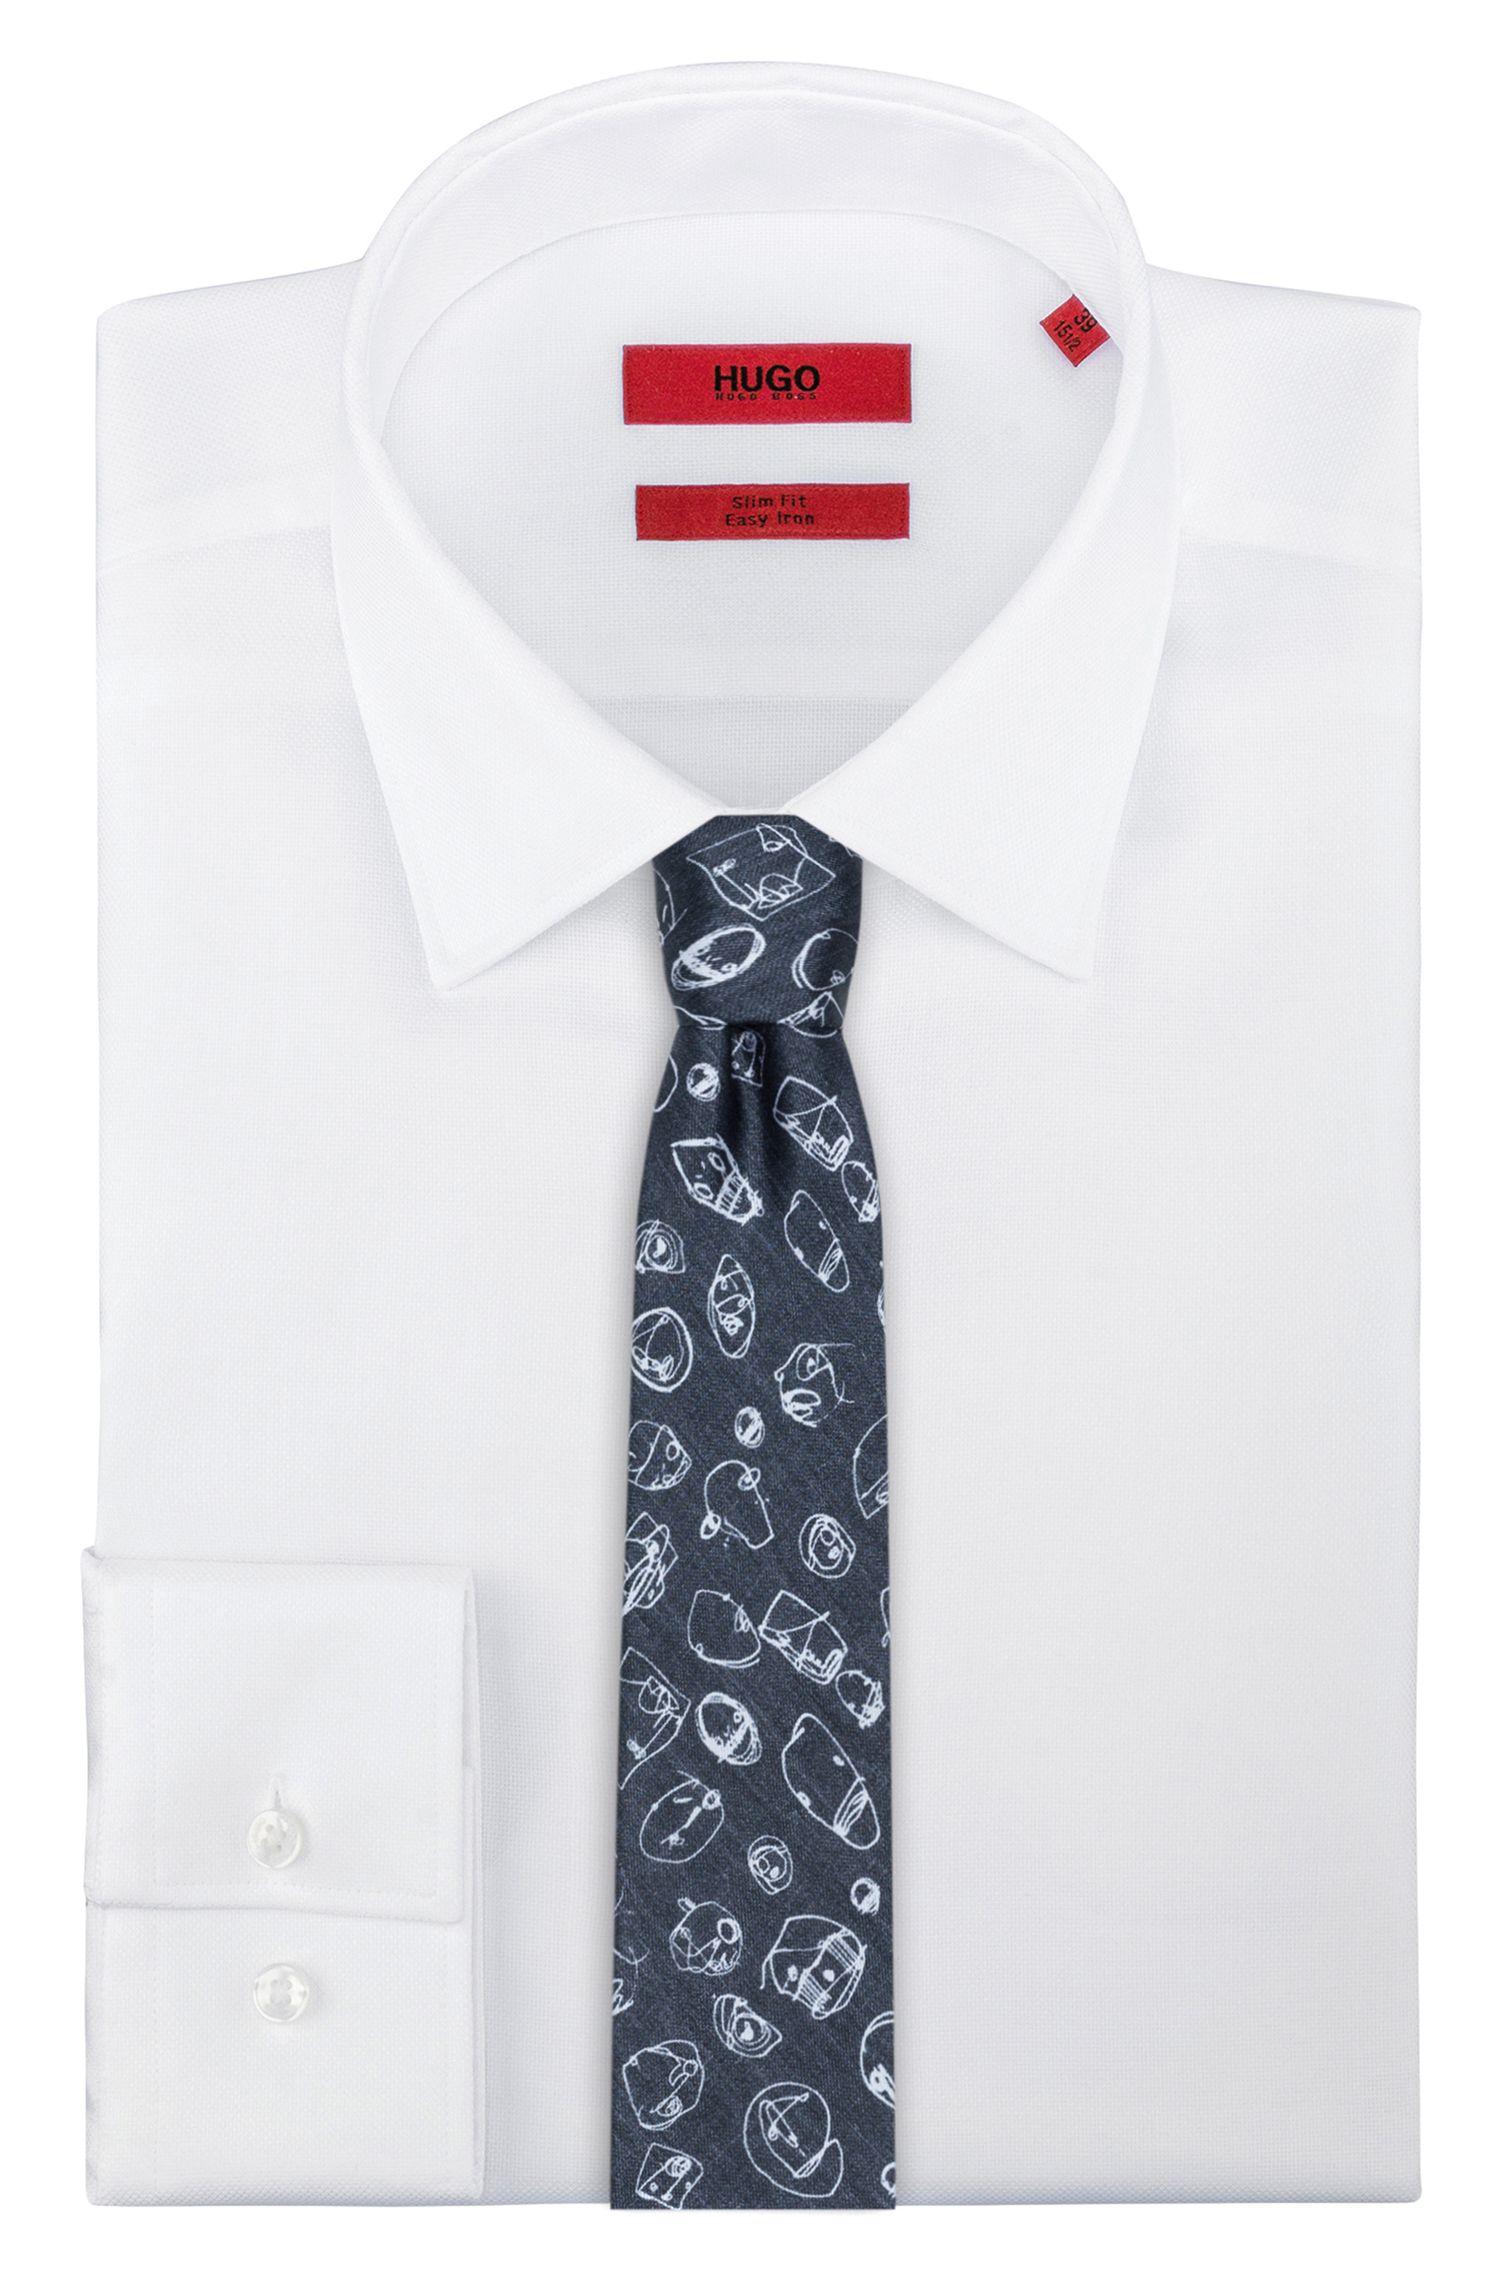 Gerade geschnittene Seiden-Krawatte mit Graffiti-Print